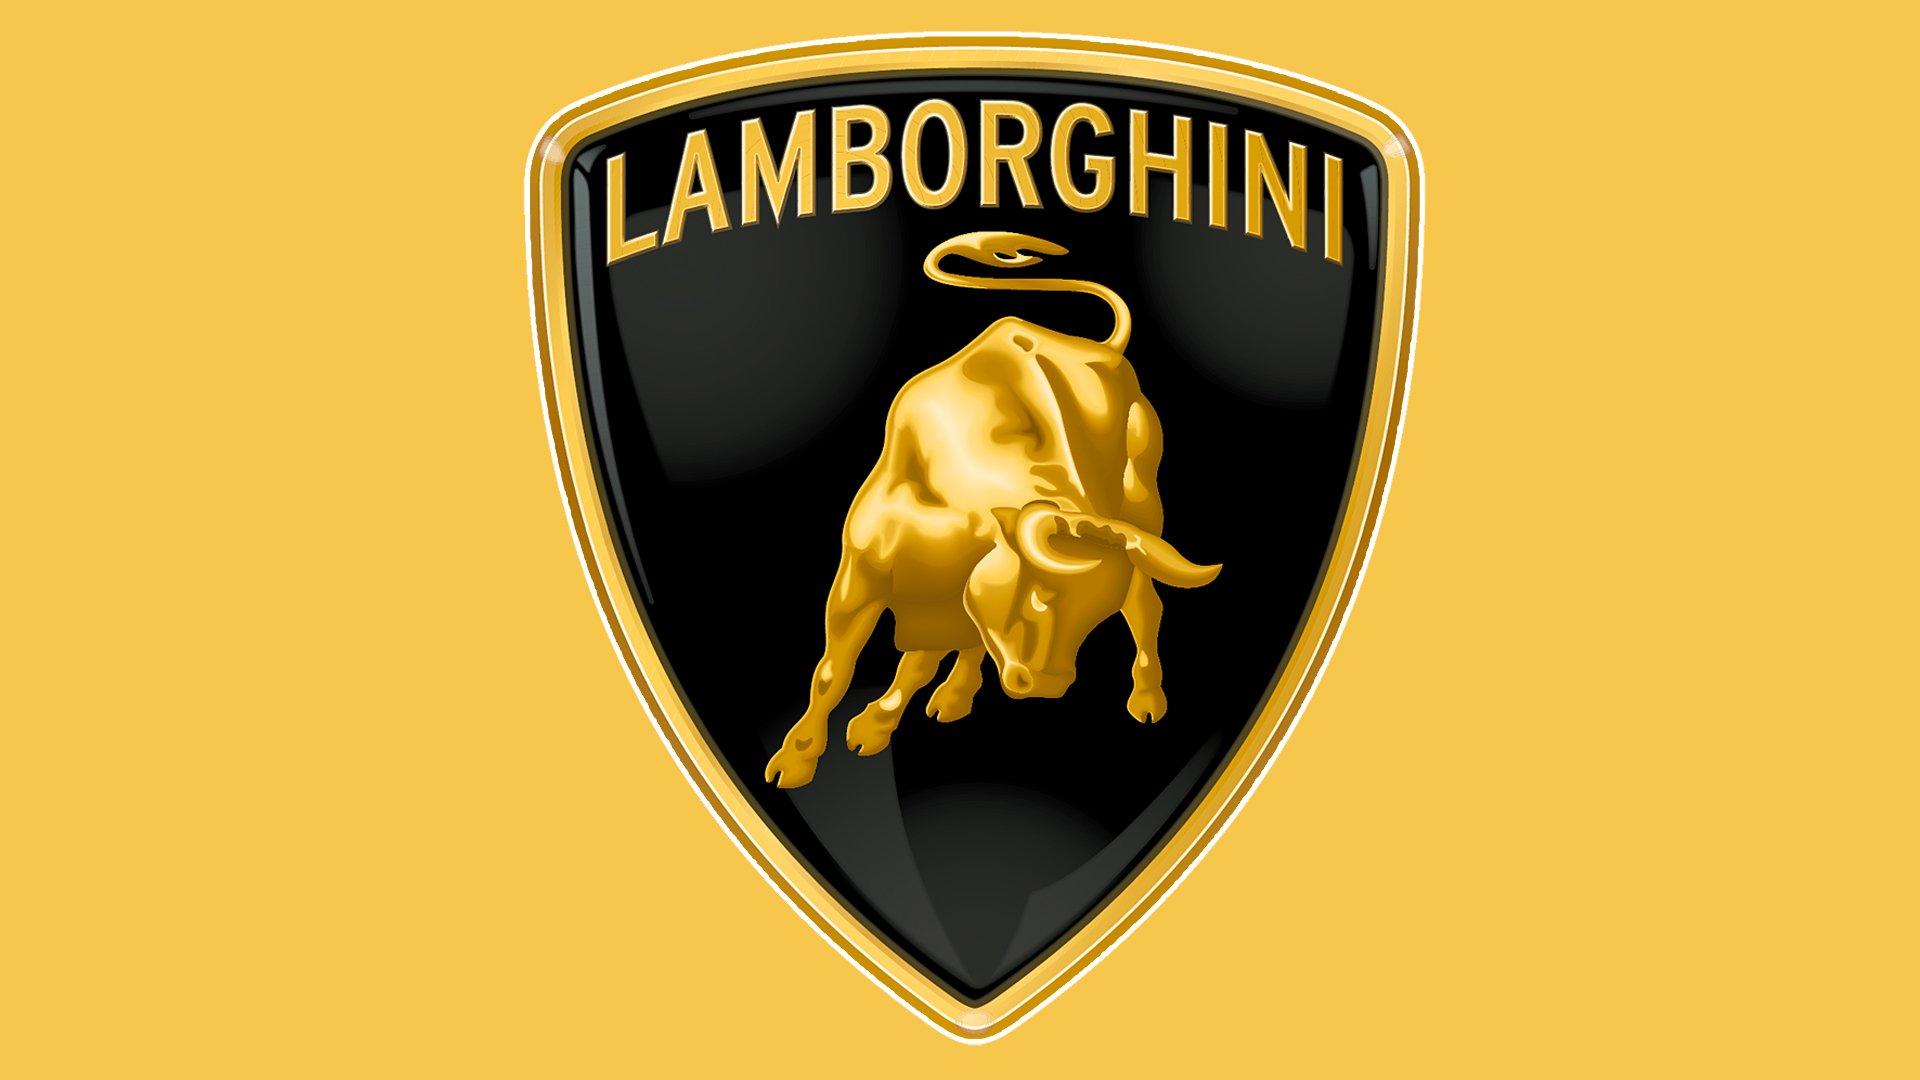 Lamborghini Logo Lamborghini Symbol Meaning History And Evolution